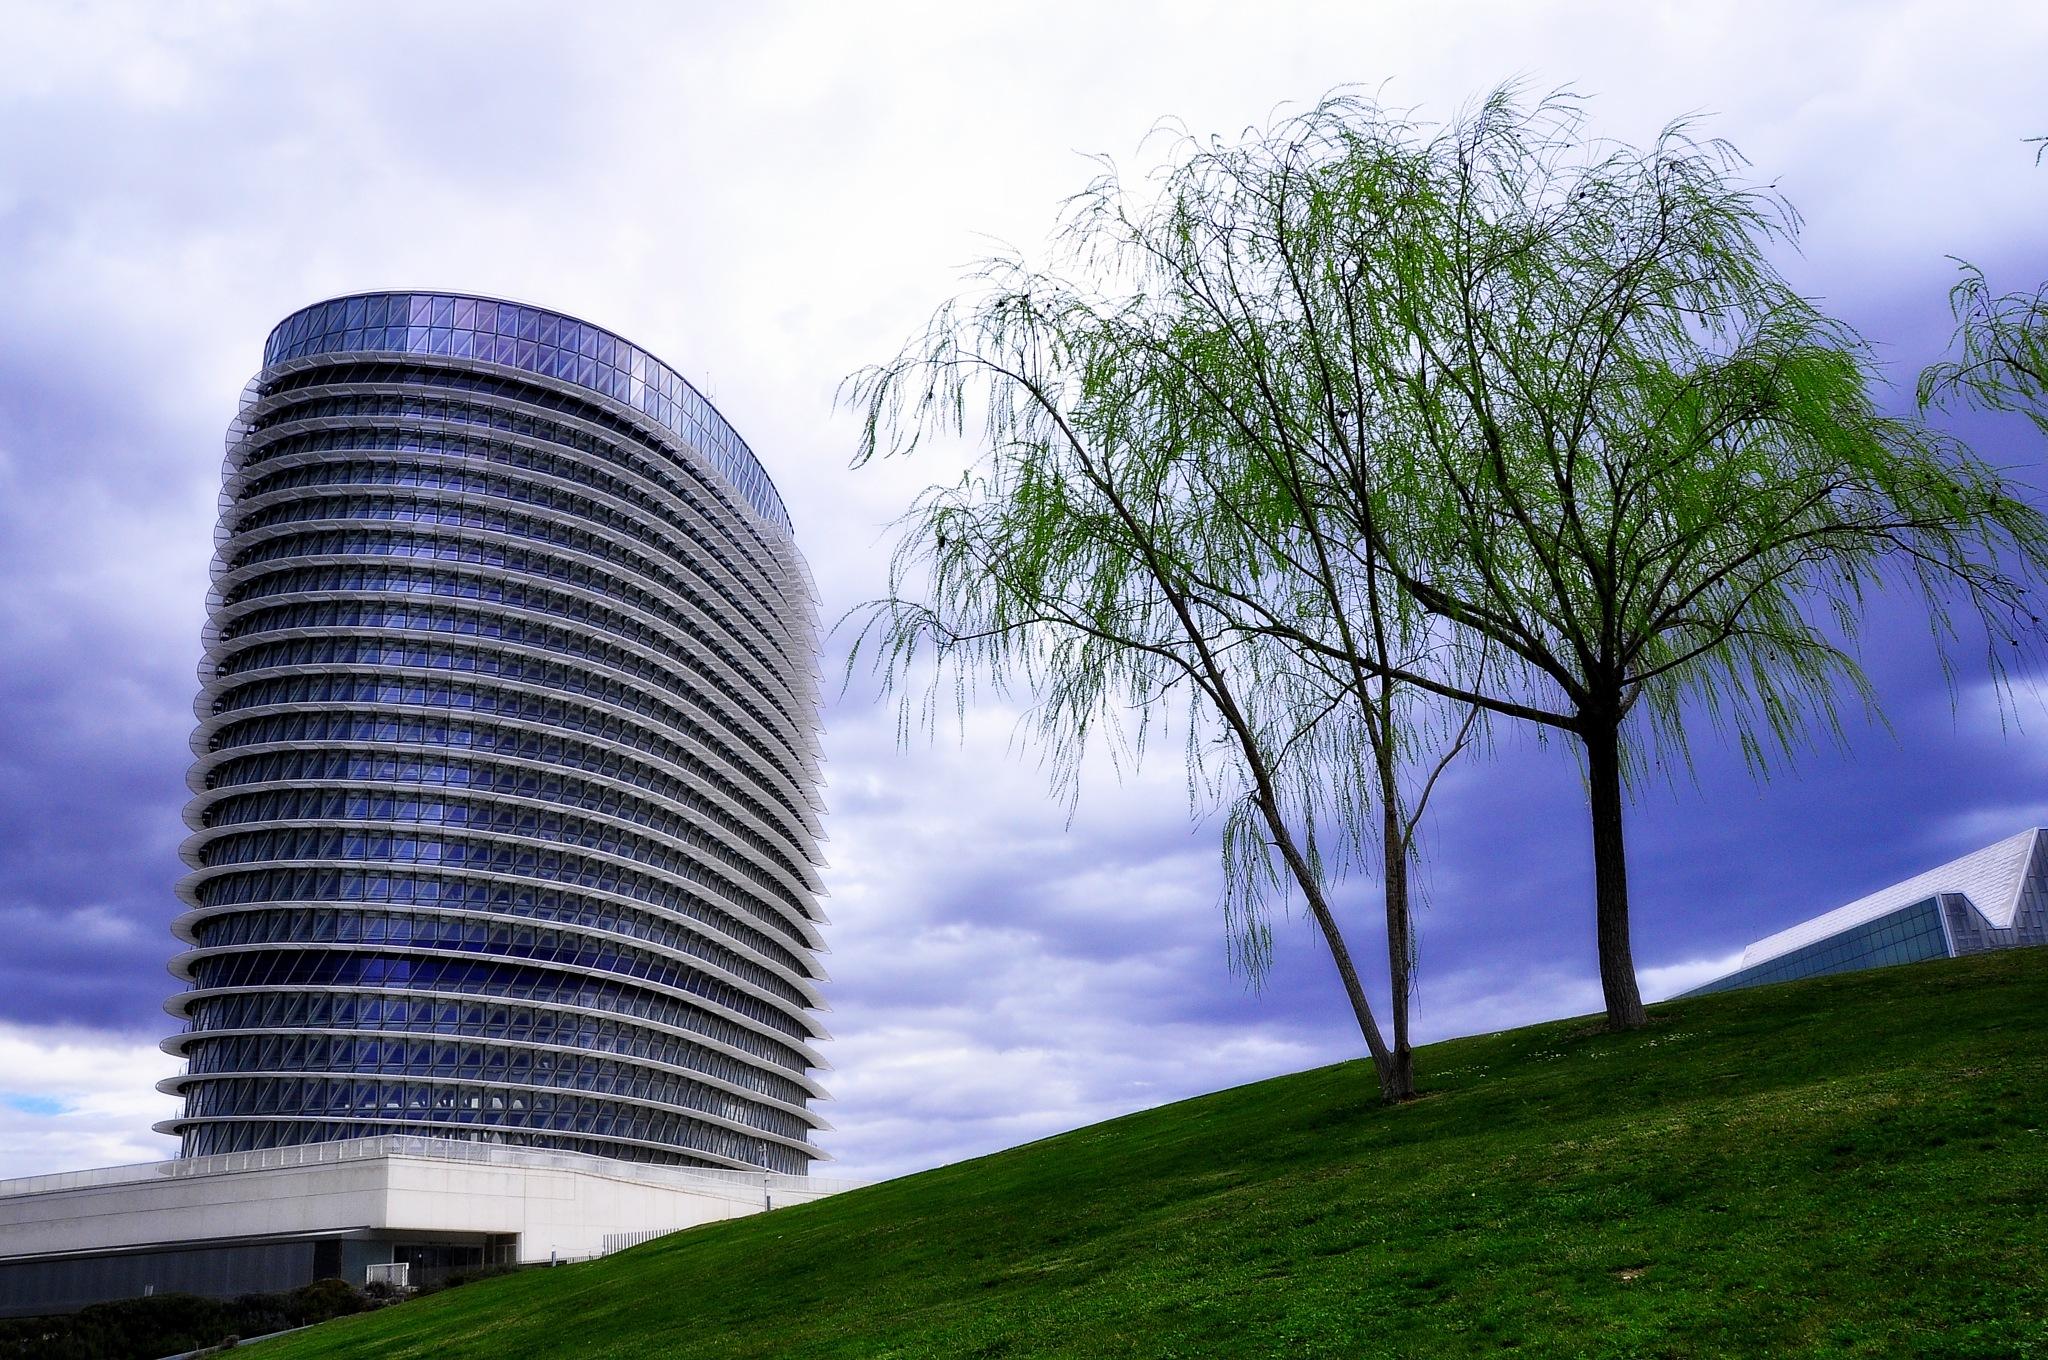 torre del agua zaragoza by angelgarcia